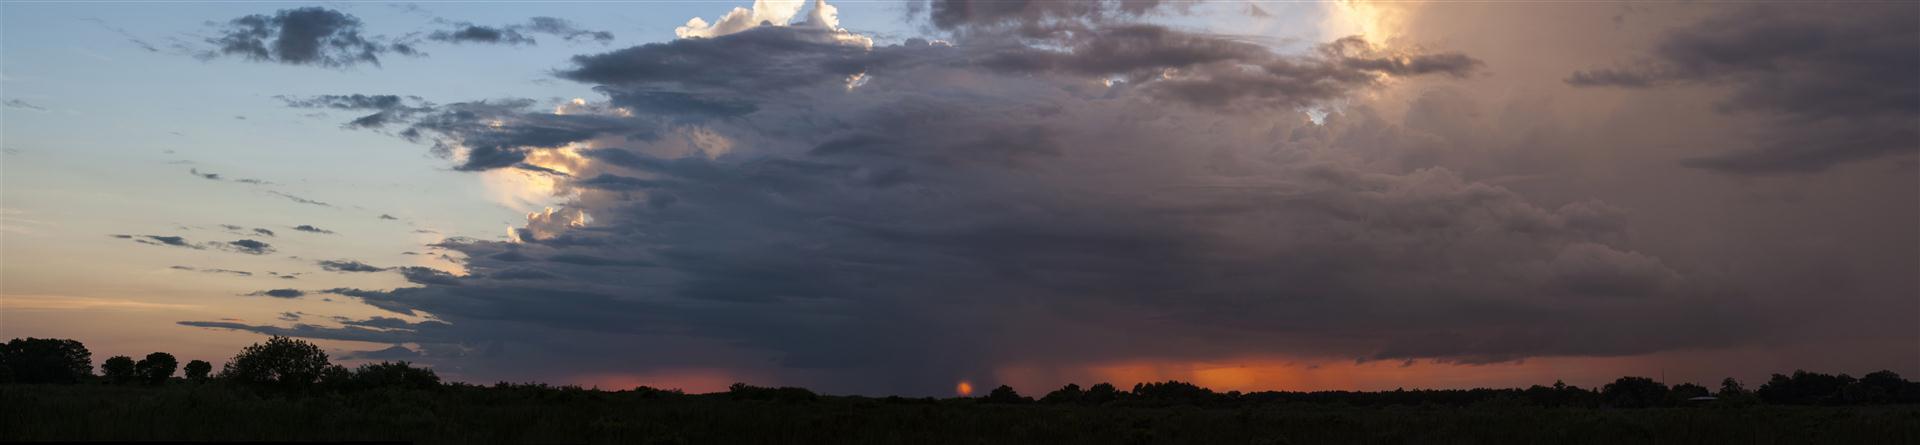 Sunset Through Storm